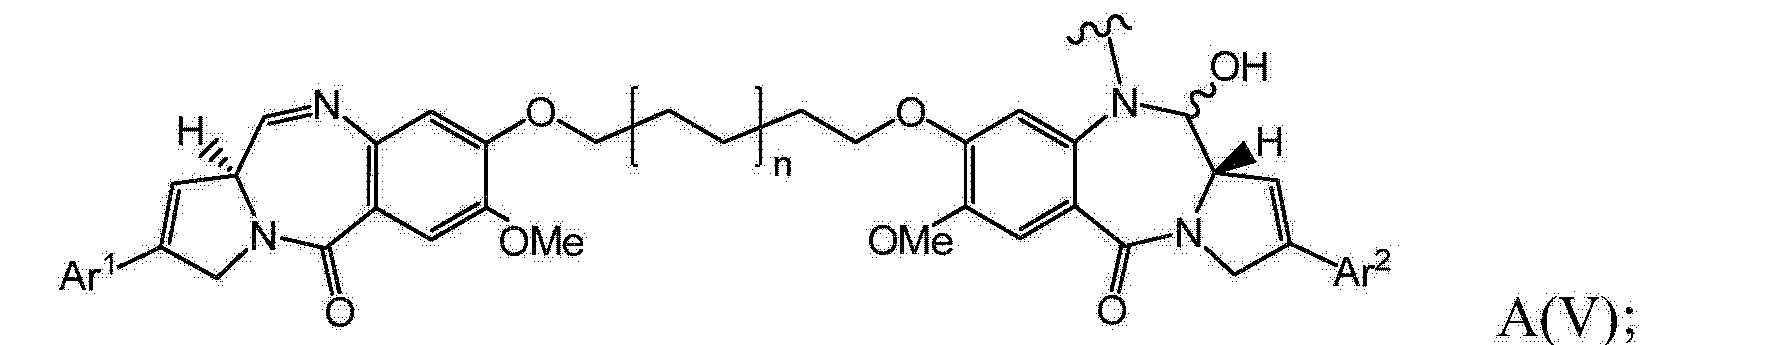 Figure CN104411721AD00733